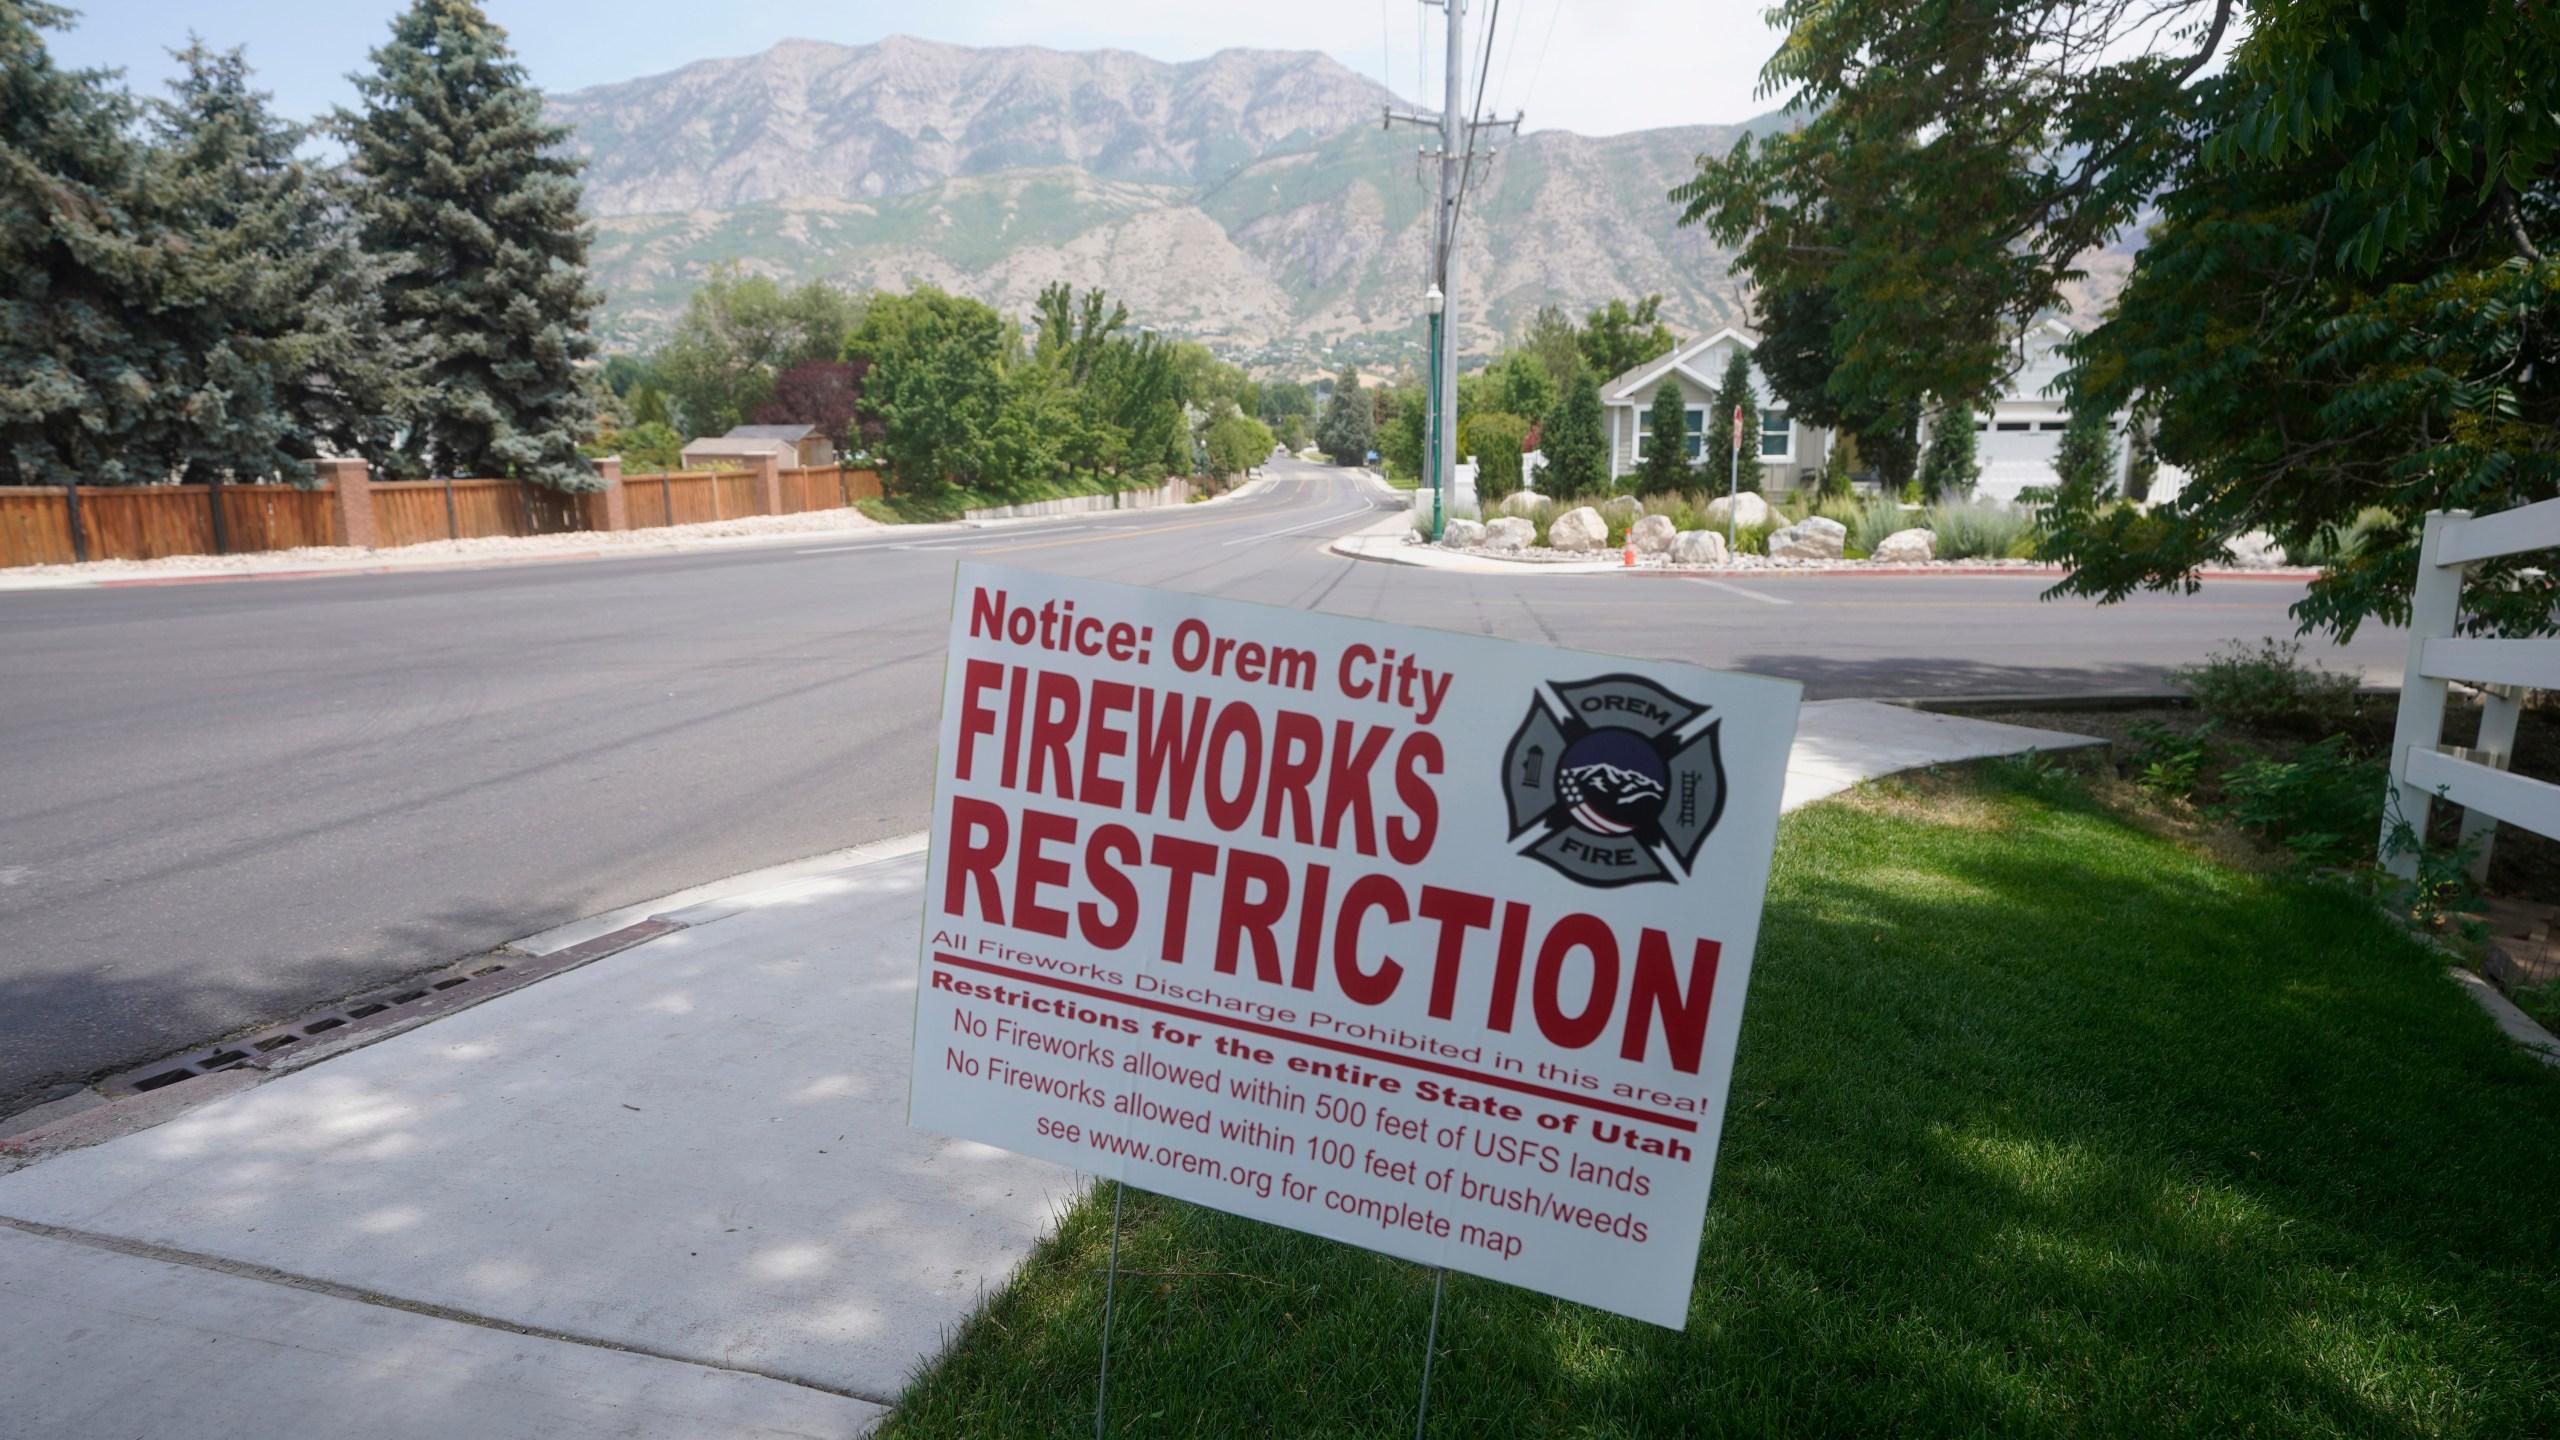 "A ""Orem City Fireworks Restriction"" sign is shown on Tuesday, June 22, 2021, in Orem, Utah. (AP Photo/Rick Bowmer)"